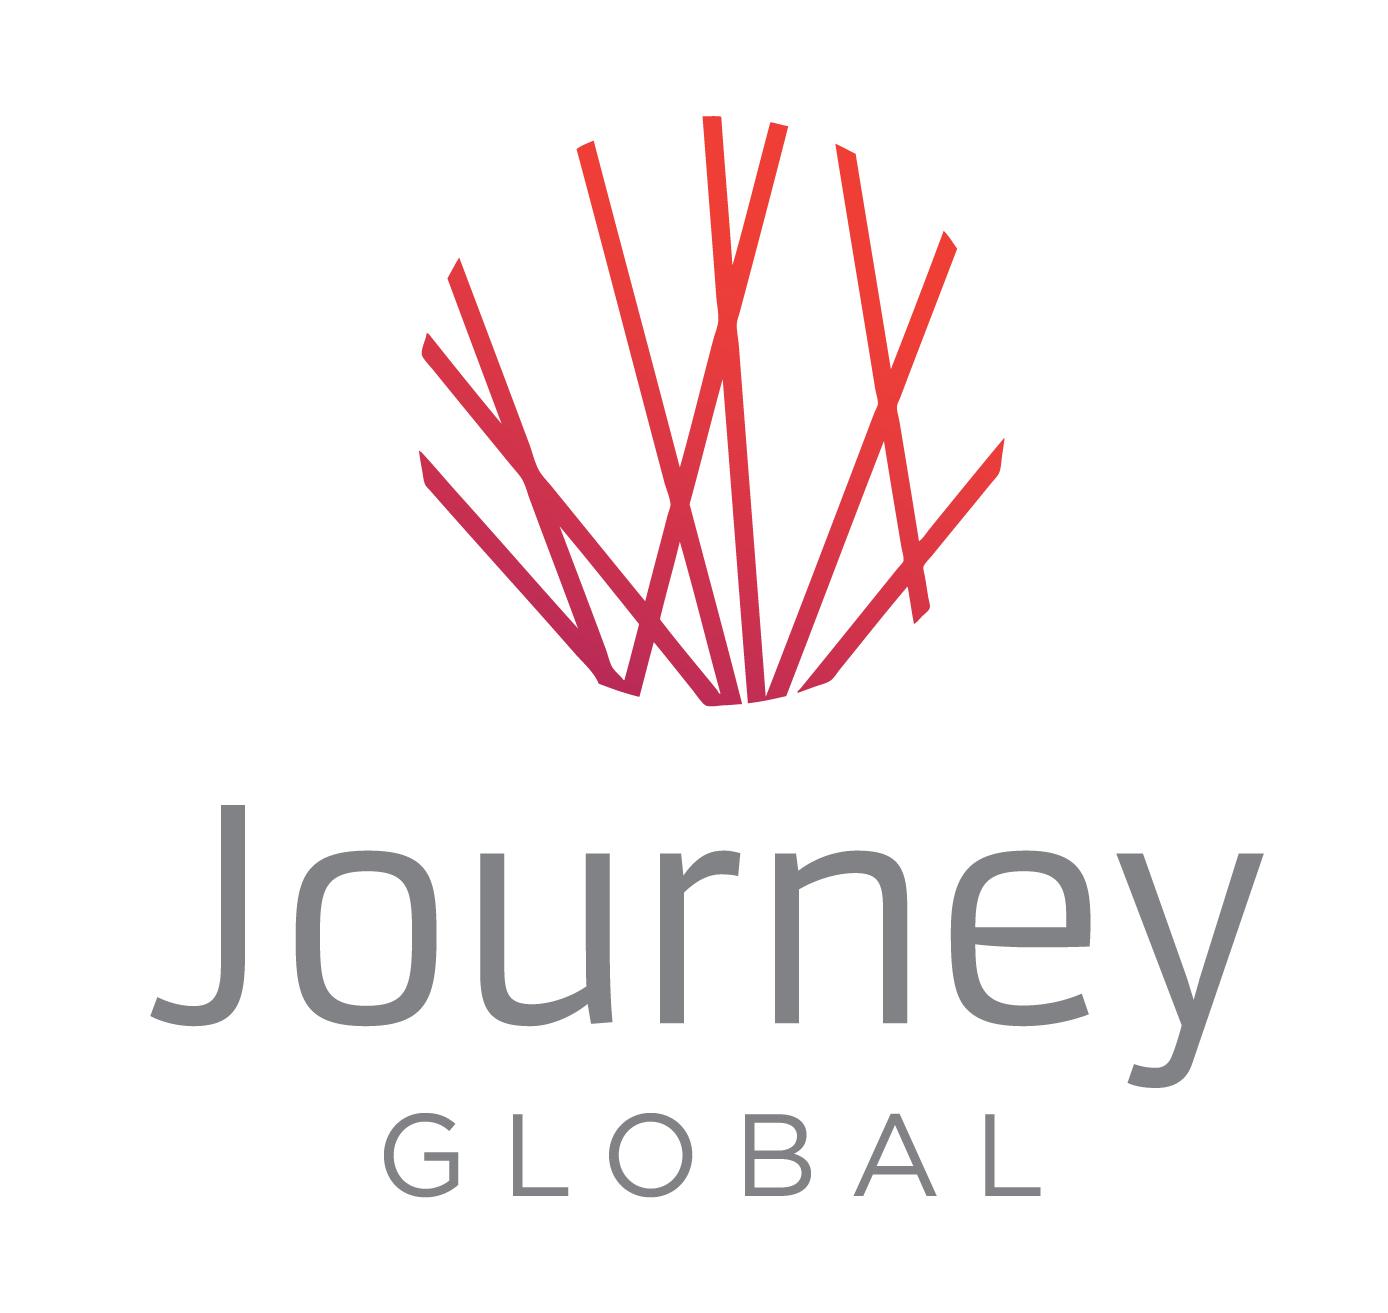 Journey Global Square.jpeg